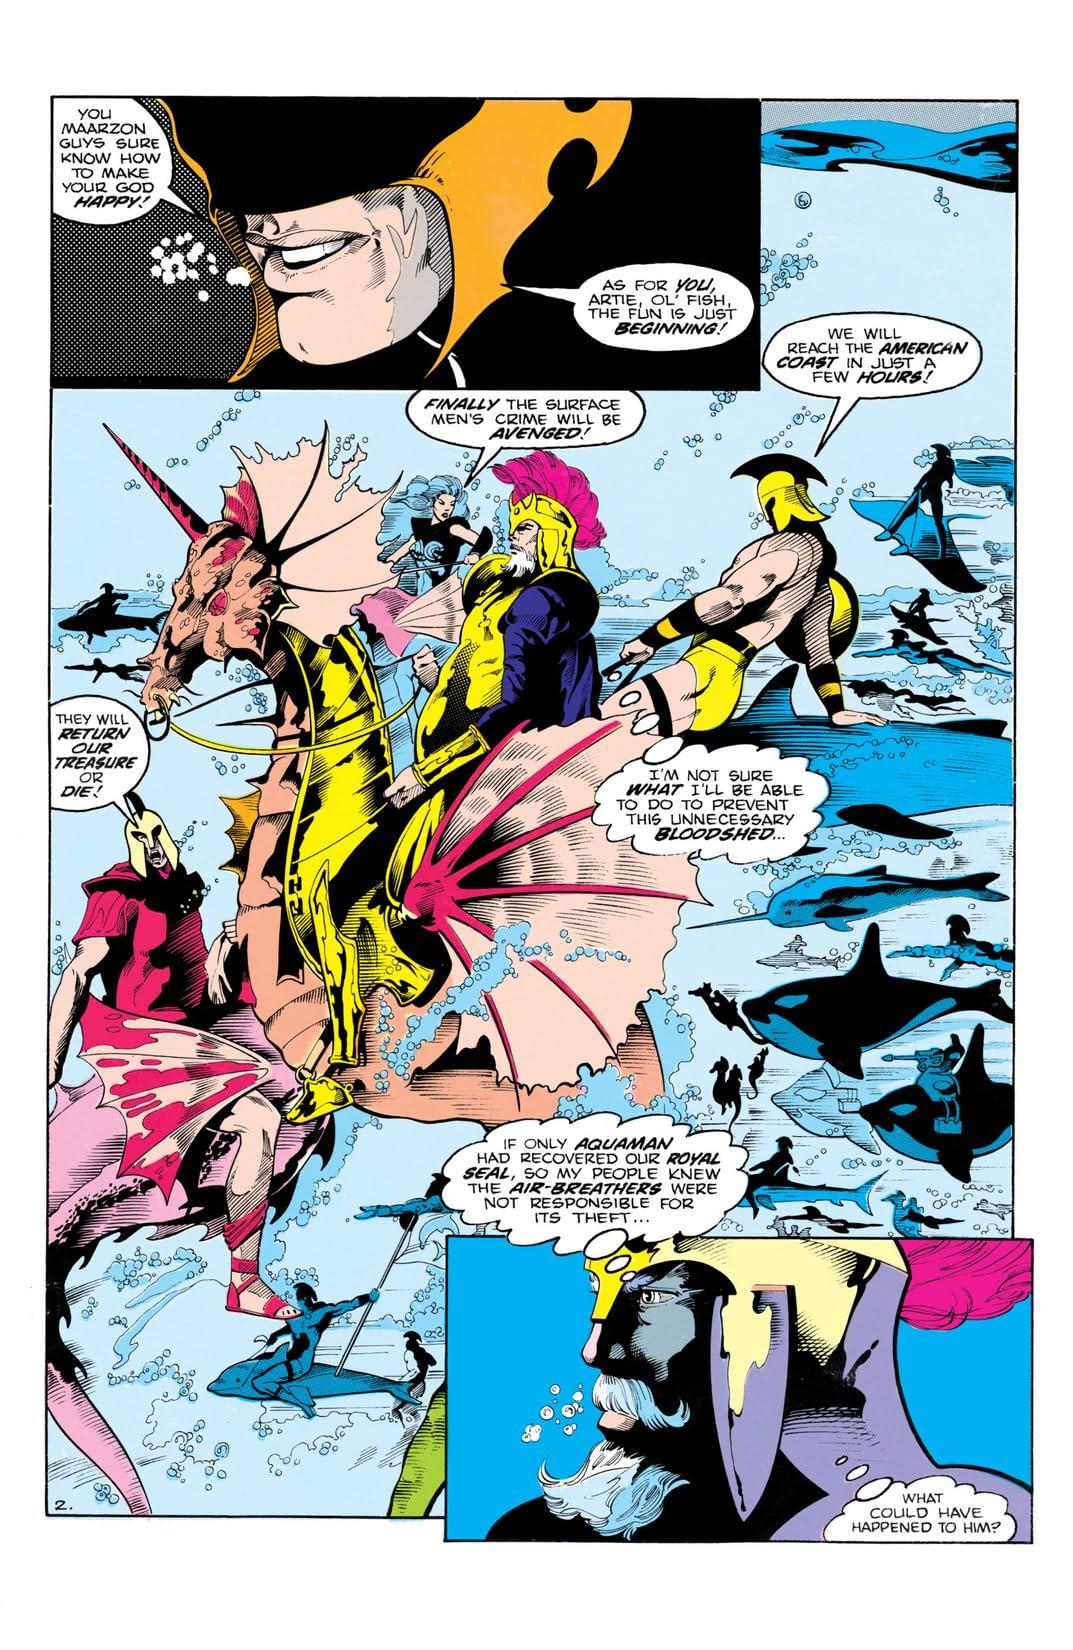 Aquaman (1986) #3 (of 4)